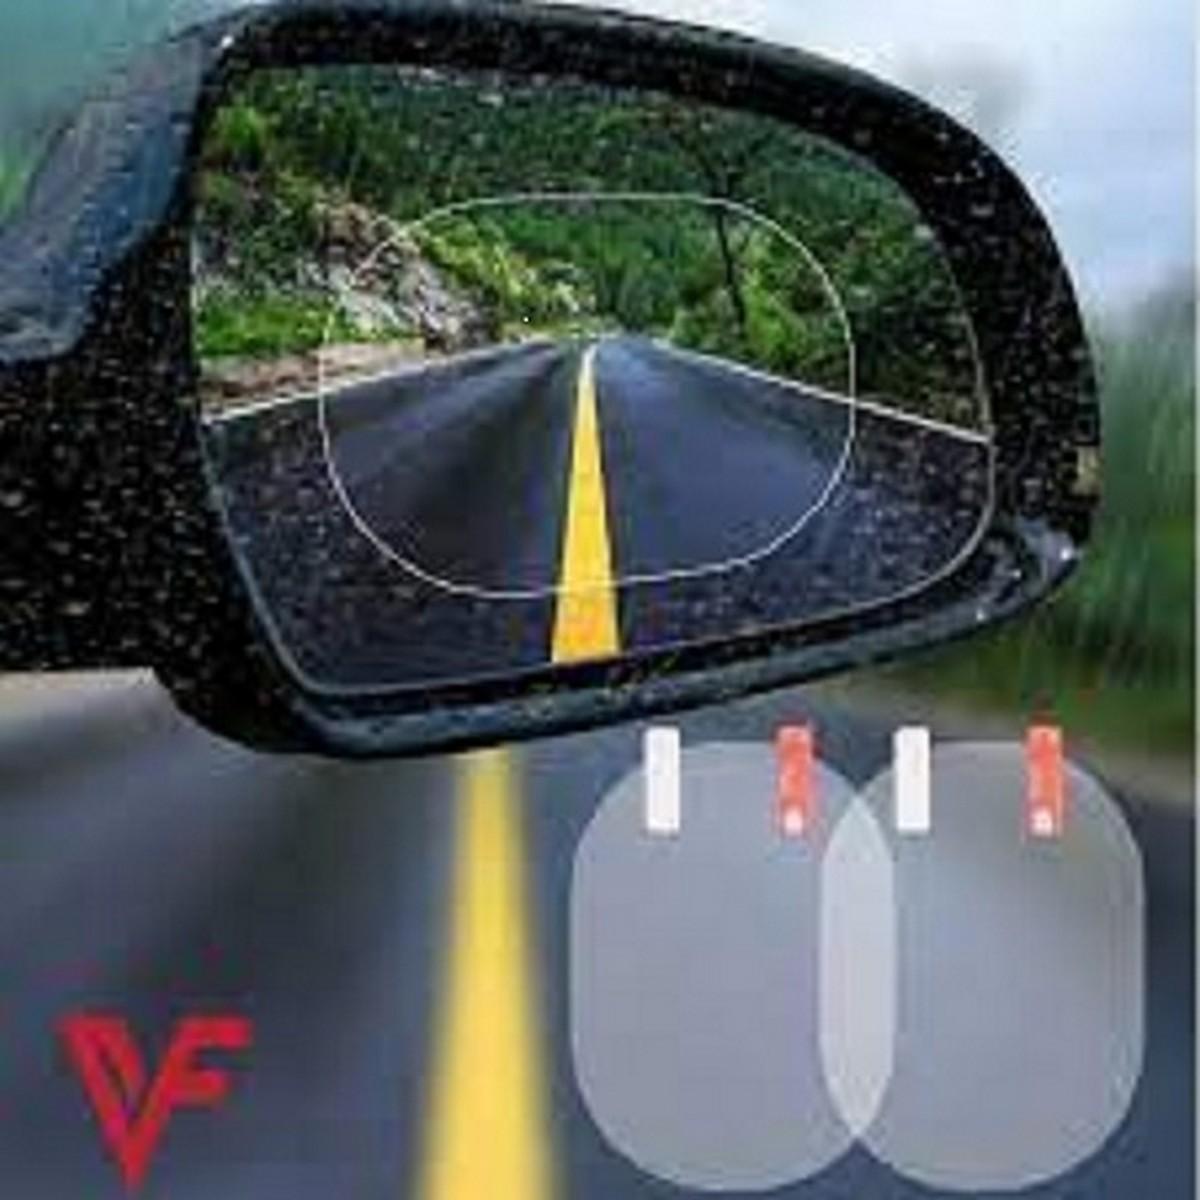 Anti Fog sticker for car 2 pcs Car Rear View Mirror Protective Film 95 x 135 mm & 170 x 200 mm, Anti Dazzle Waterproof Rainproof Anti Fog Car Film Side Glass Side Mirror